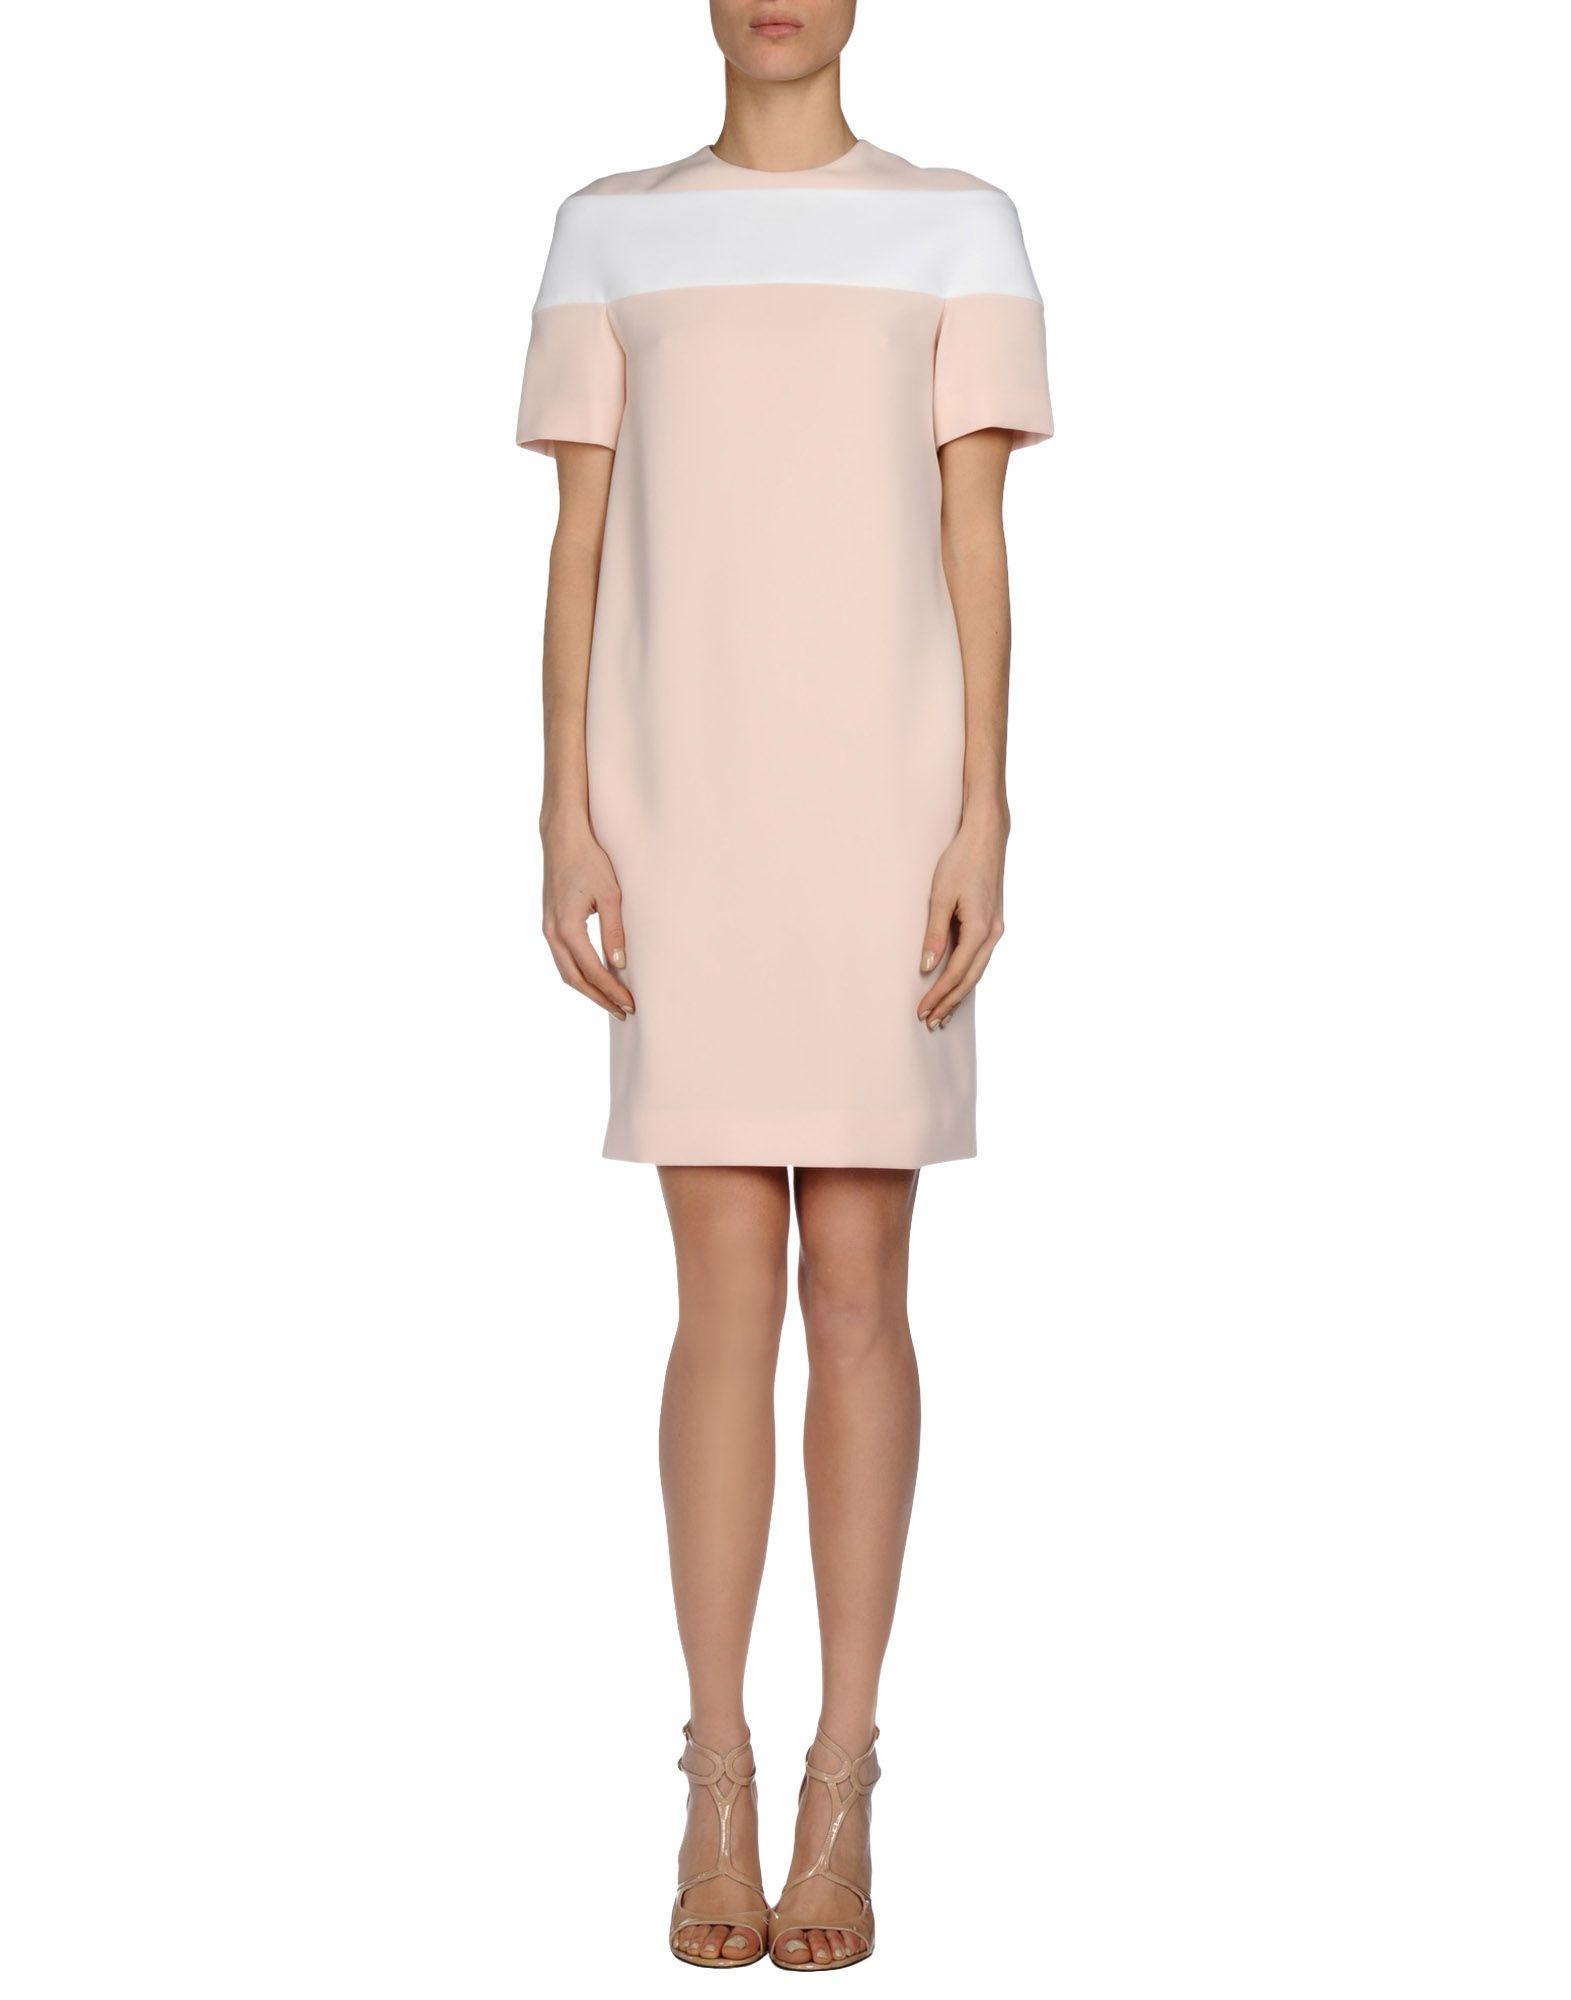 Balenciaga short dress in pink light pink lyst for Pastel pink dress shirt